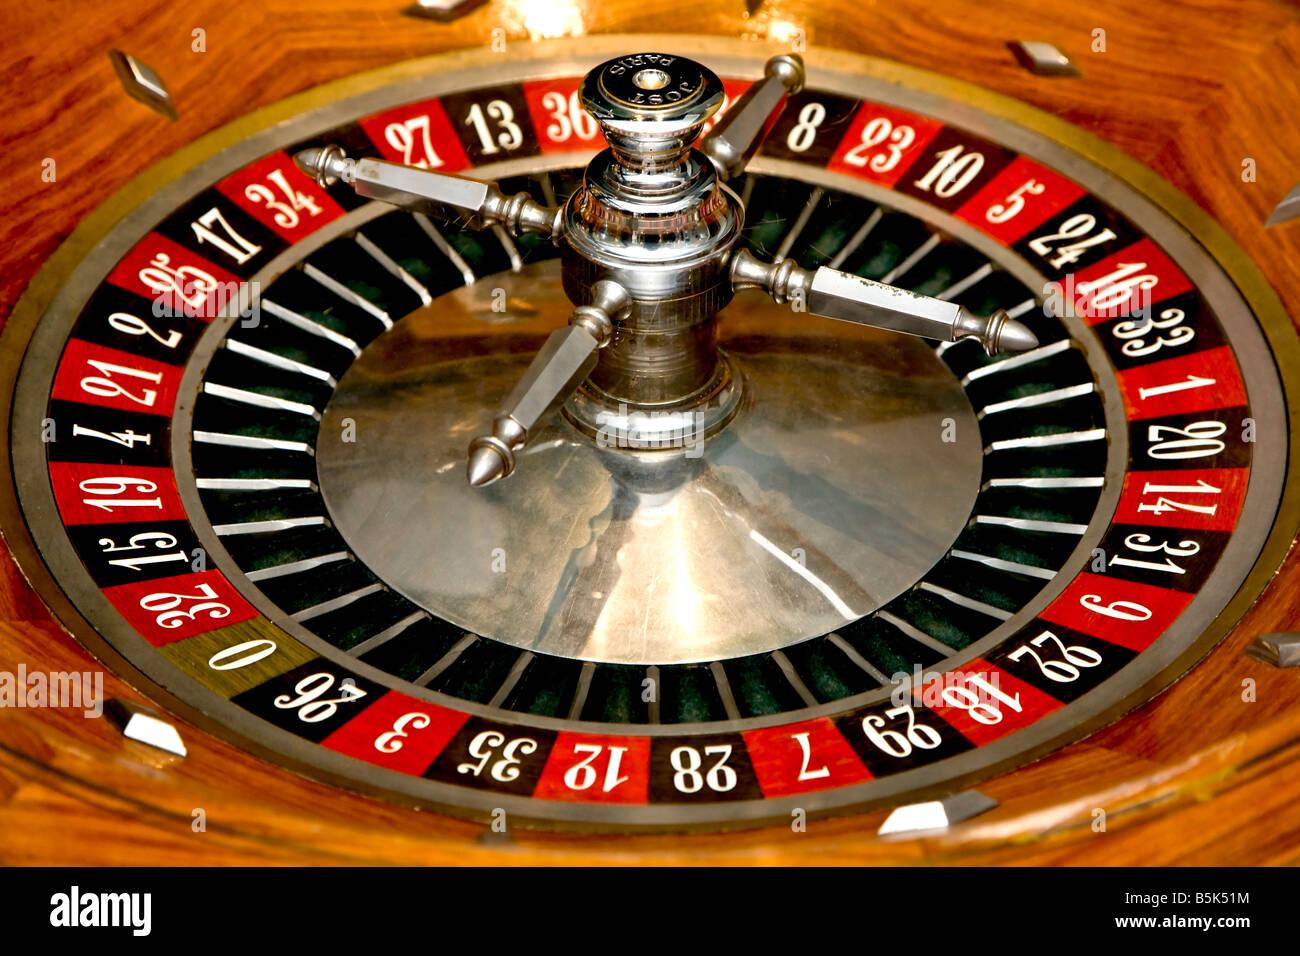 roulette wheel stock photos roulette wheel stock images. Black Bedroom Furniture Sets. Home Design Ideas